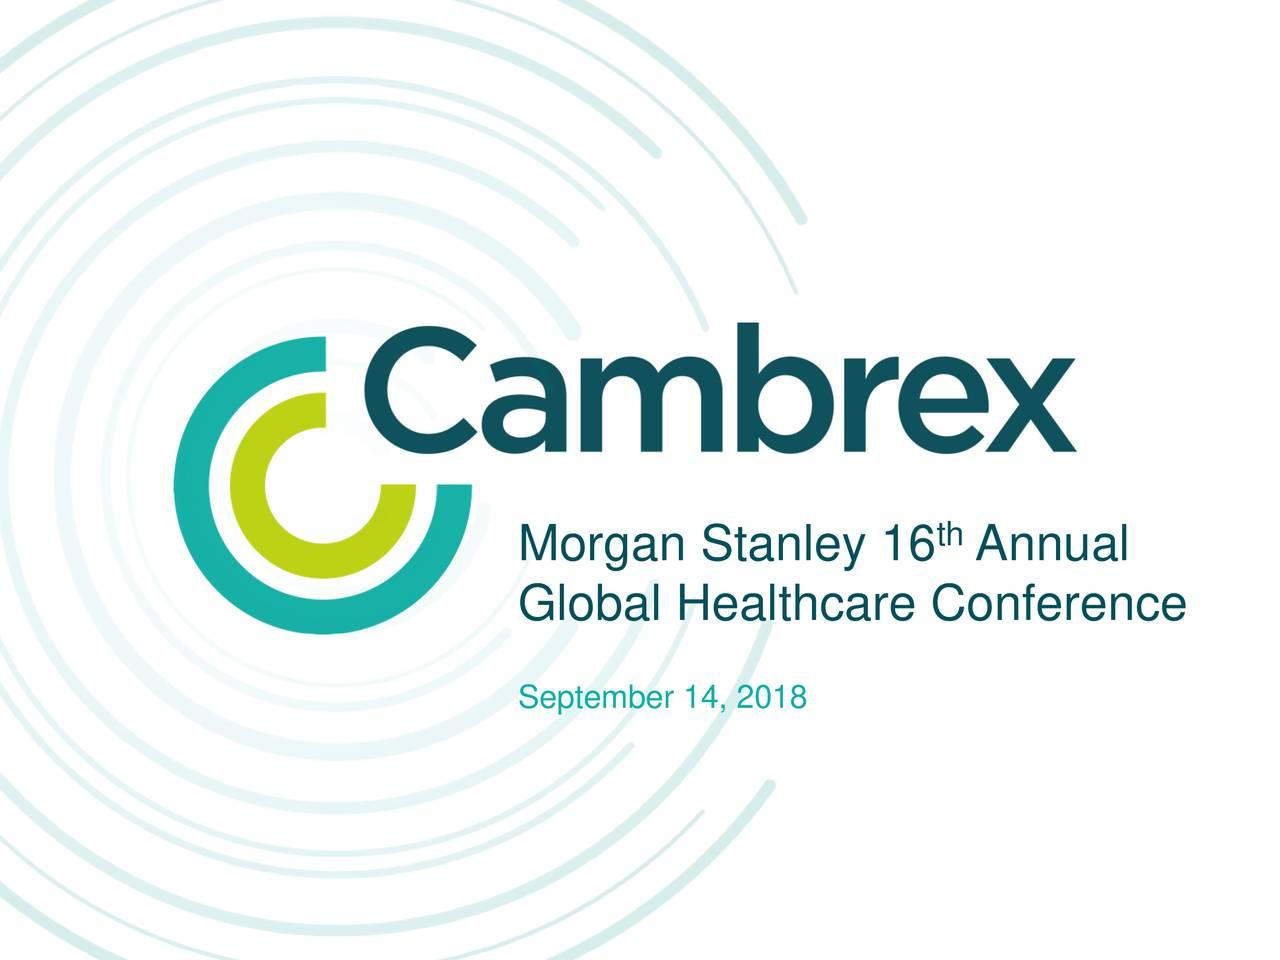 Cambrex Cbm Presents At Morgan Stanley 16th Annual